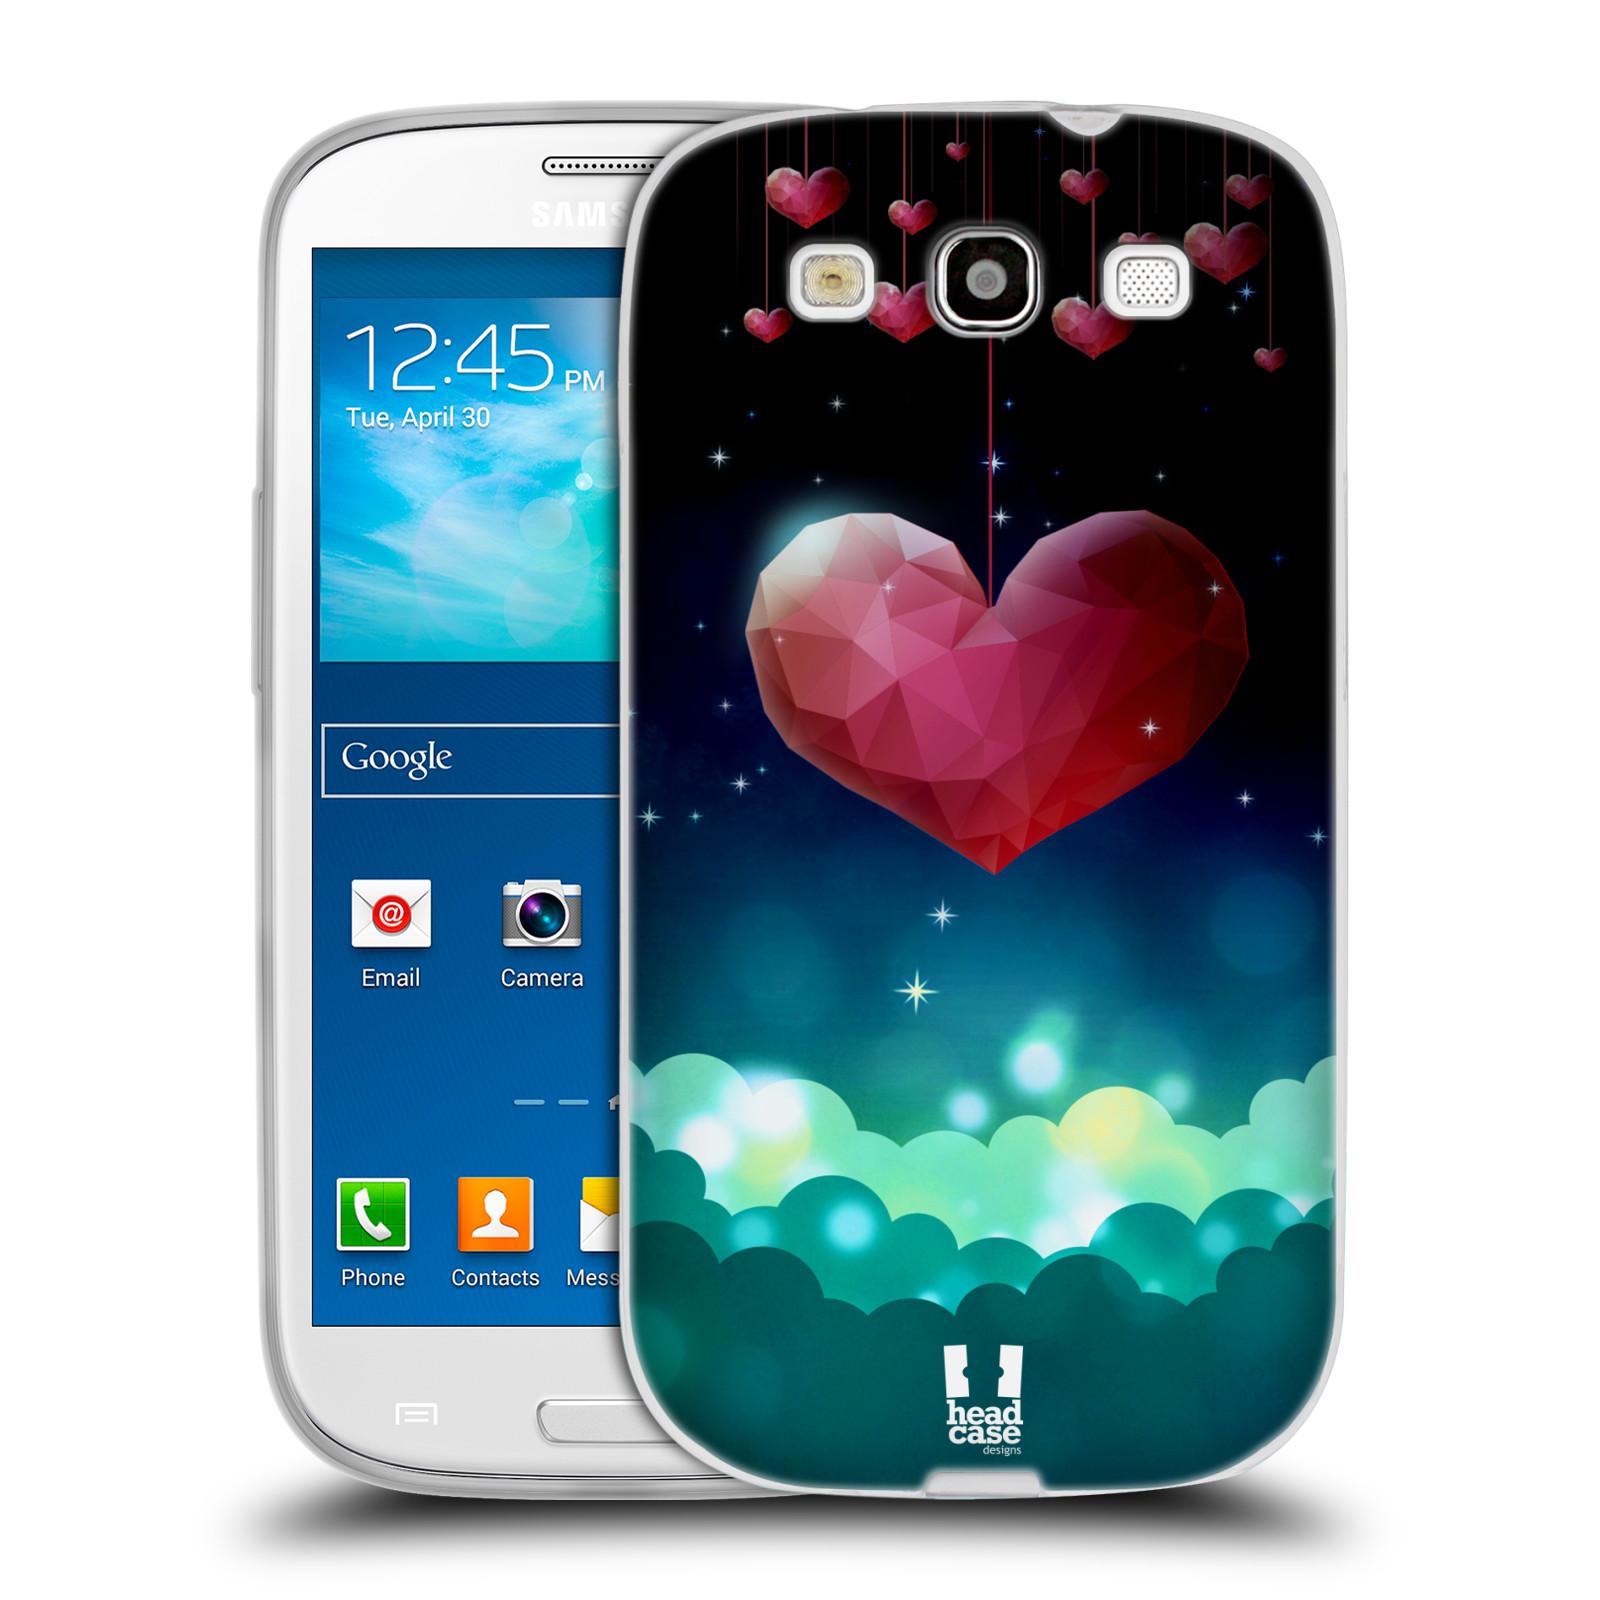 Silikonové pouzdro na mobil Samsung Galaxy S3 Neo HEAD CASE LOVE AFFLOAT SRDCE (Silikonový kryt či obal na mobilní telefon Samsung Galaxy S3 Neo GT-i9301i)